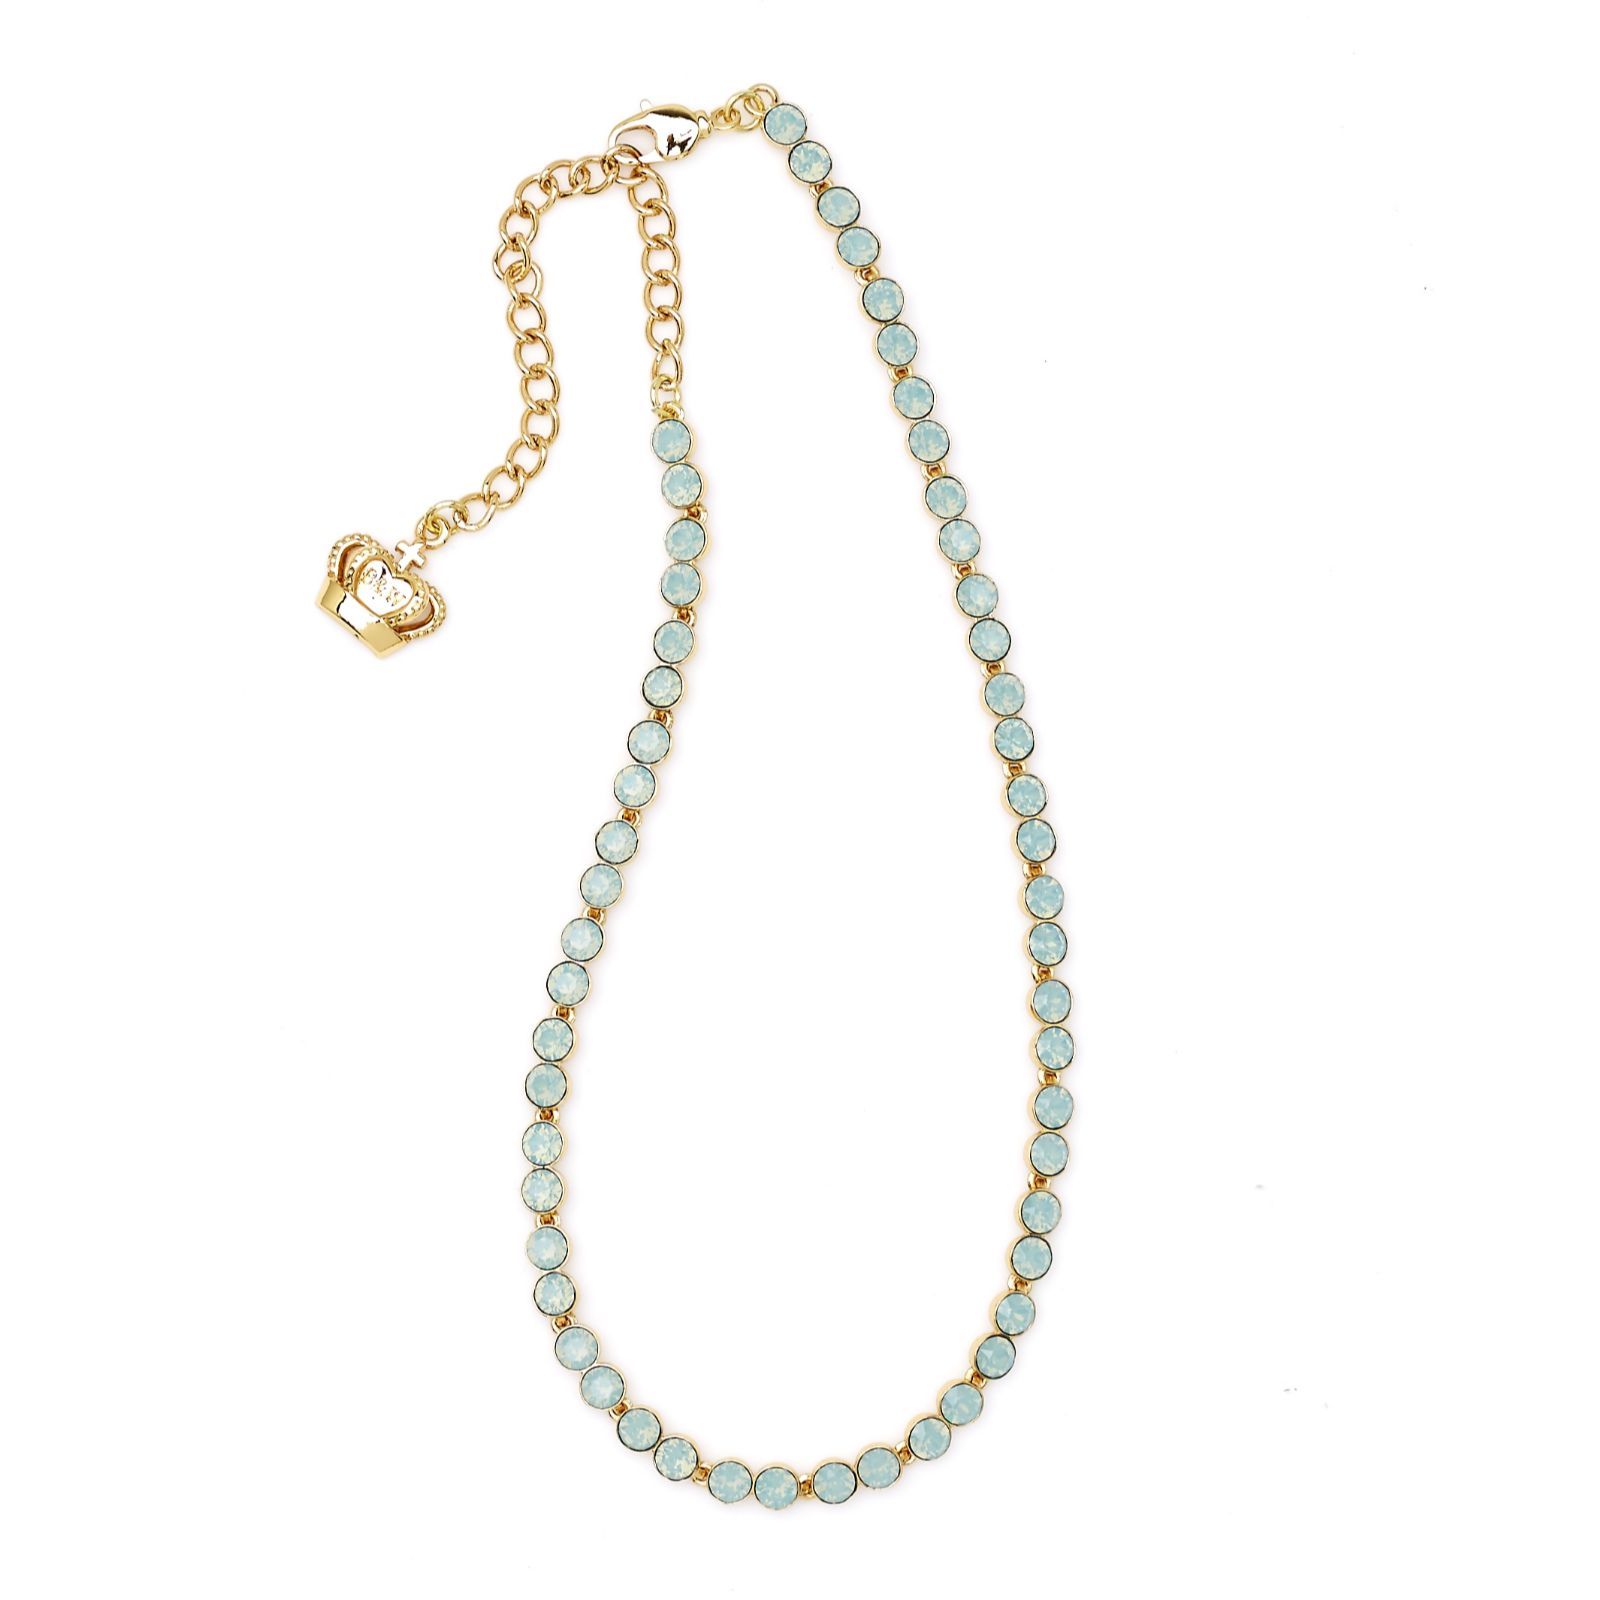 Butler & Wilson Necklace& Bracelet. Jewelry Sets Pink & Green